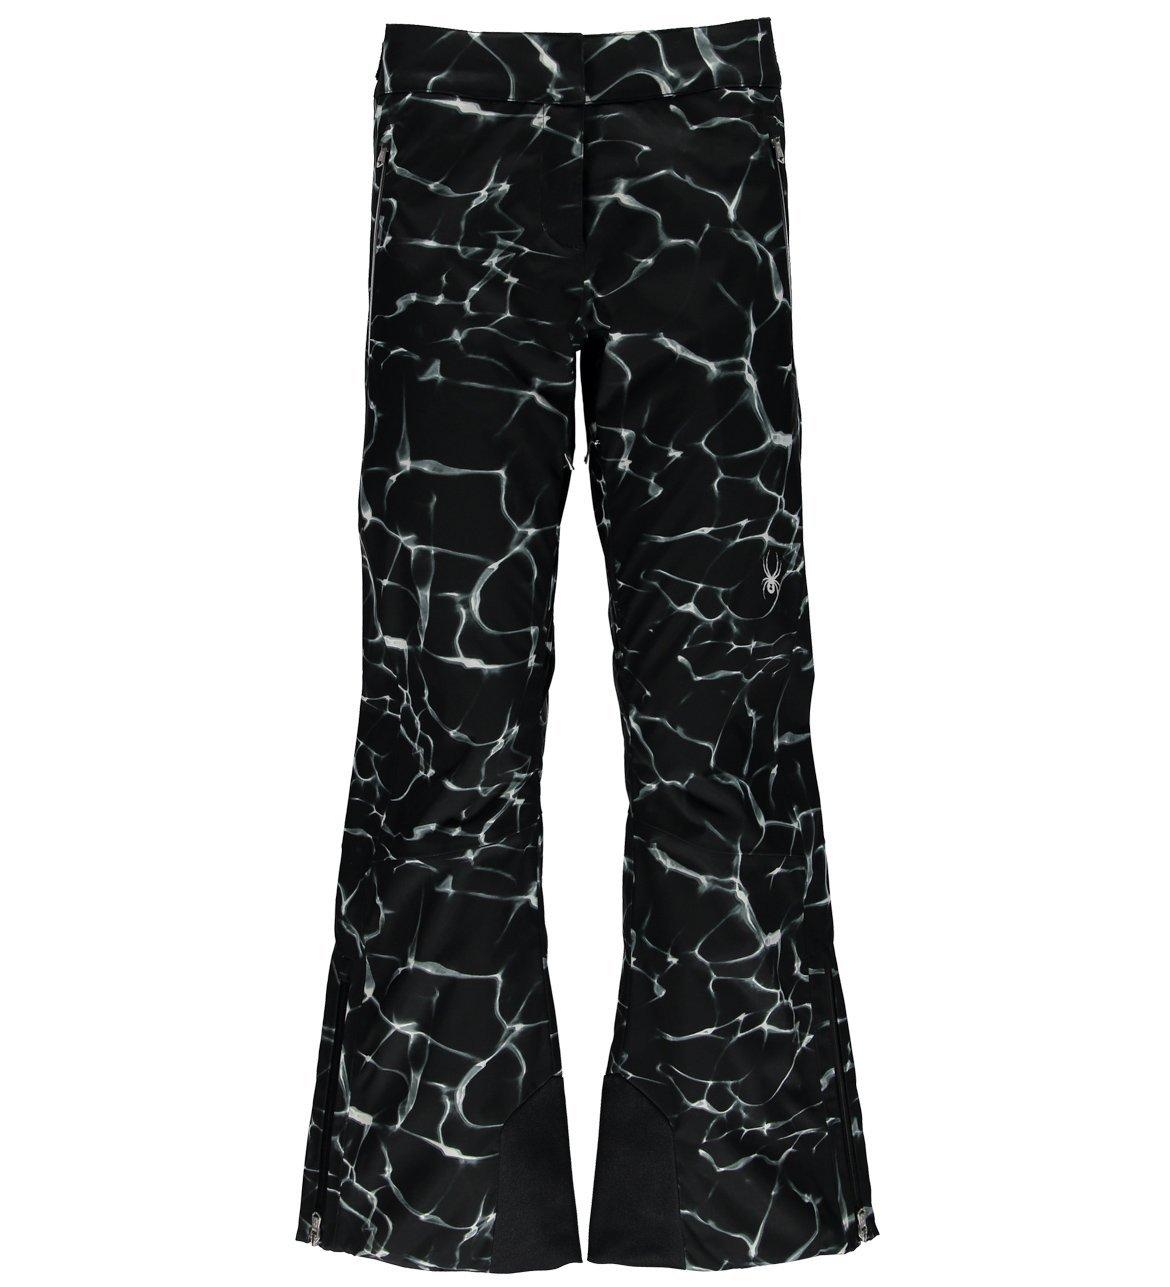 Waves Black Print 2Small Spyder Traveler Pant